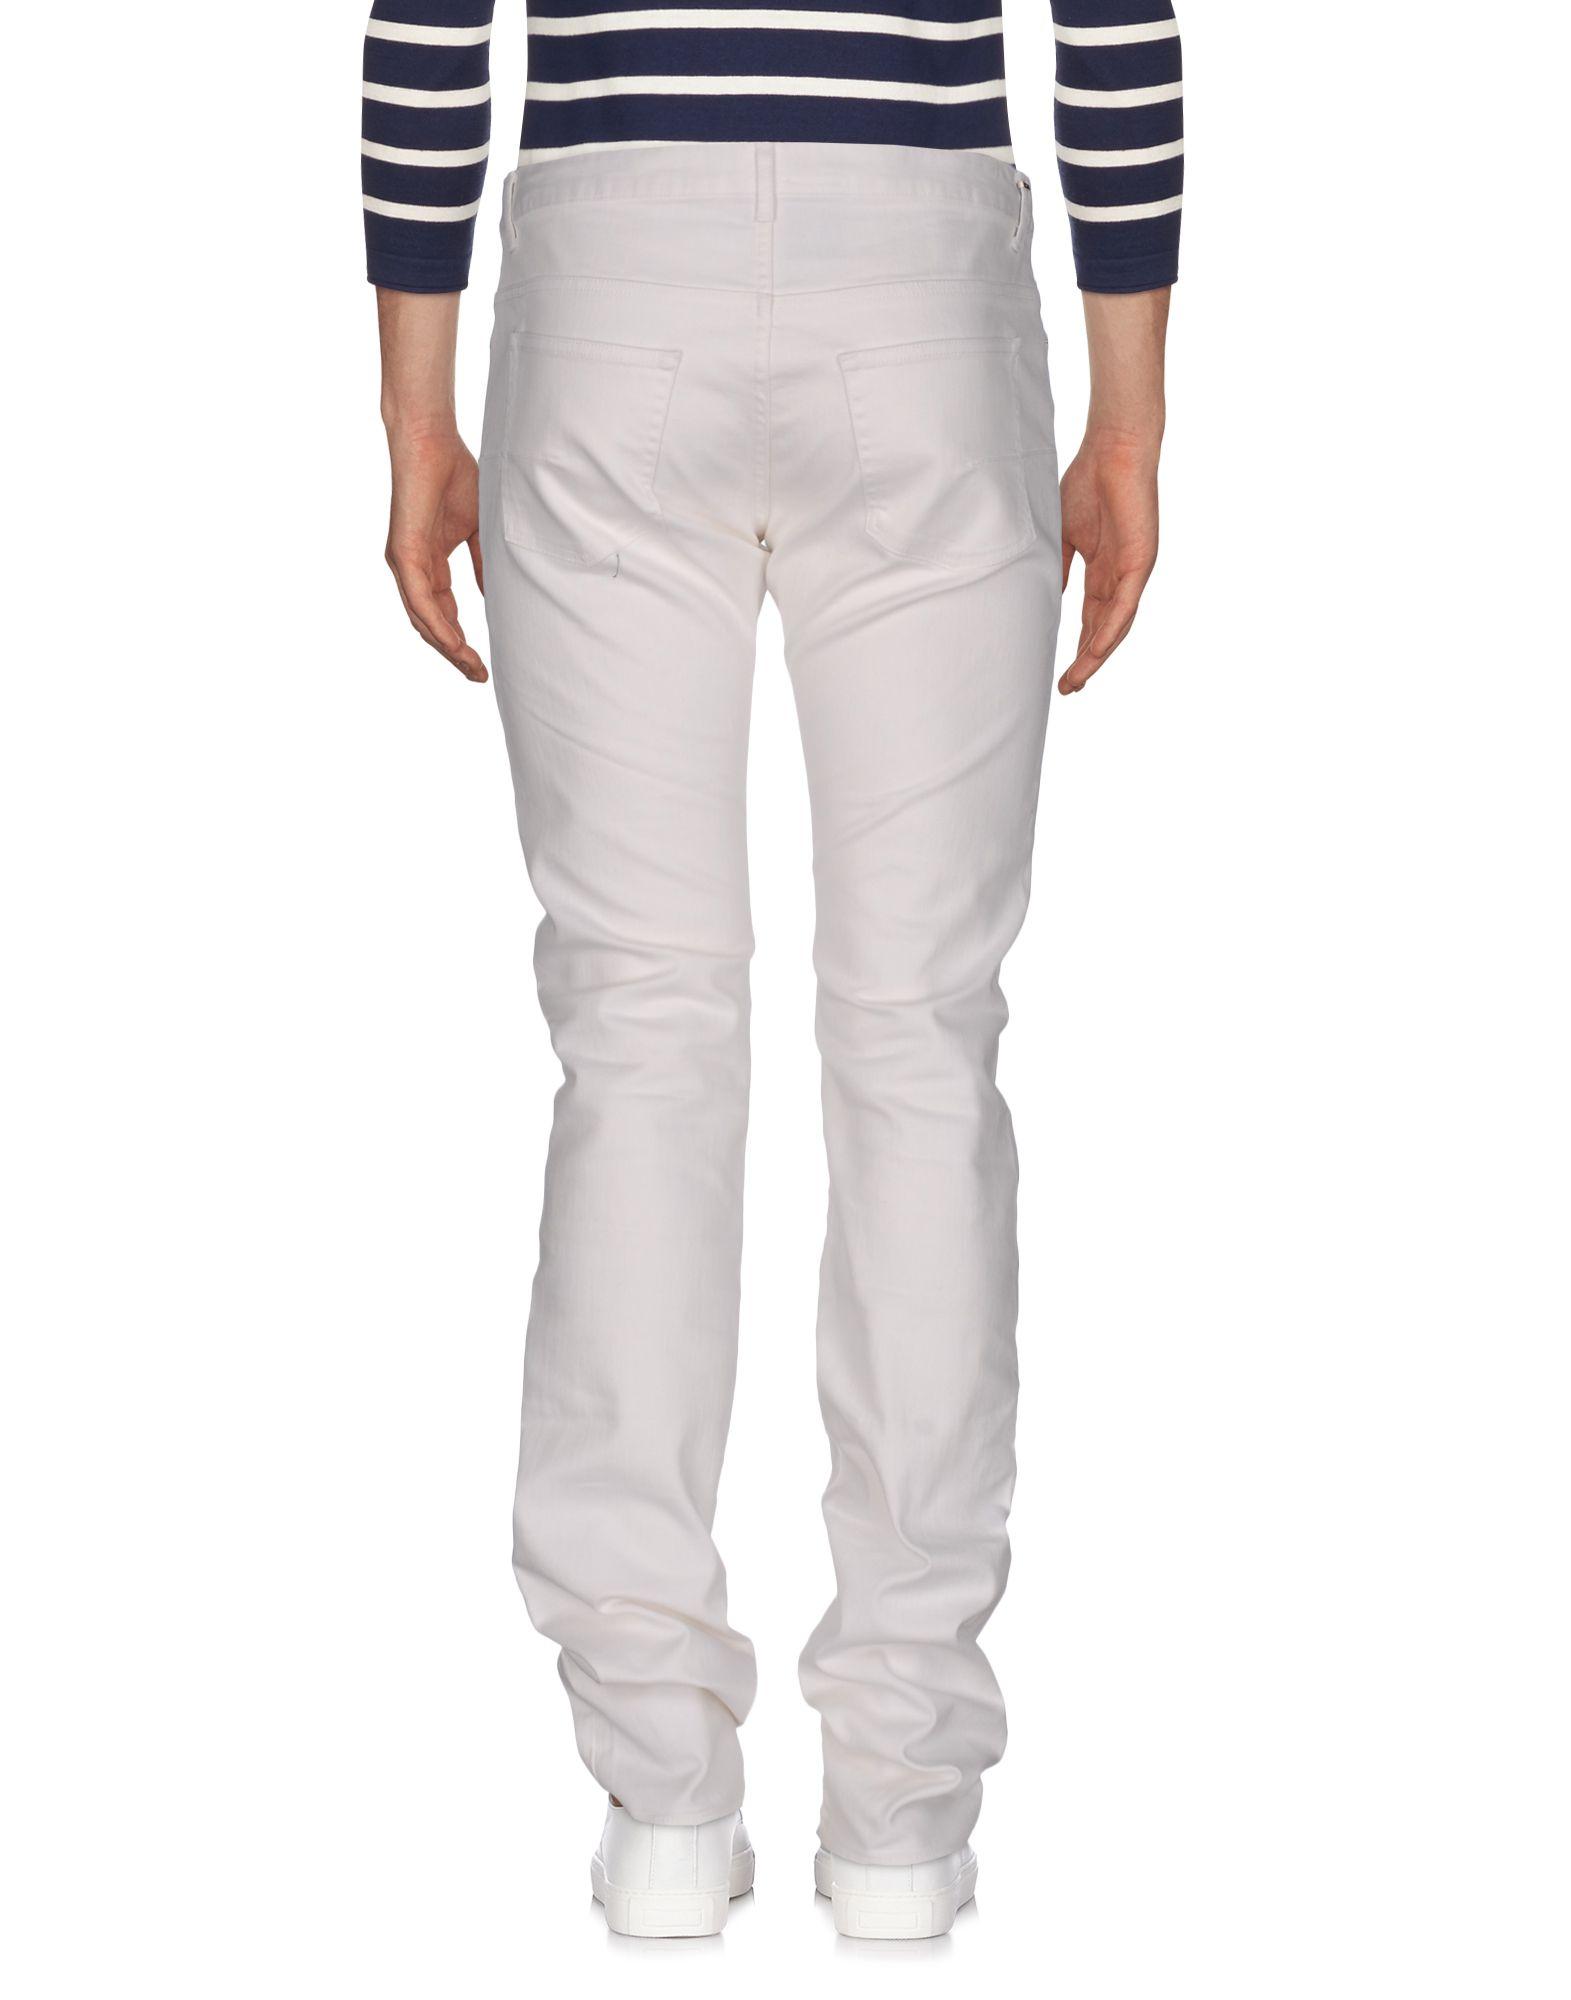 Pantaloni Dior Jeans Dior Pantaloni Homme Uomo - 42637343LH 7197f6